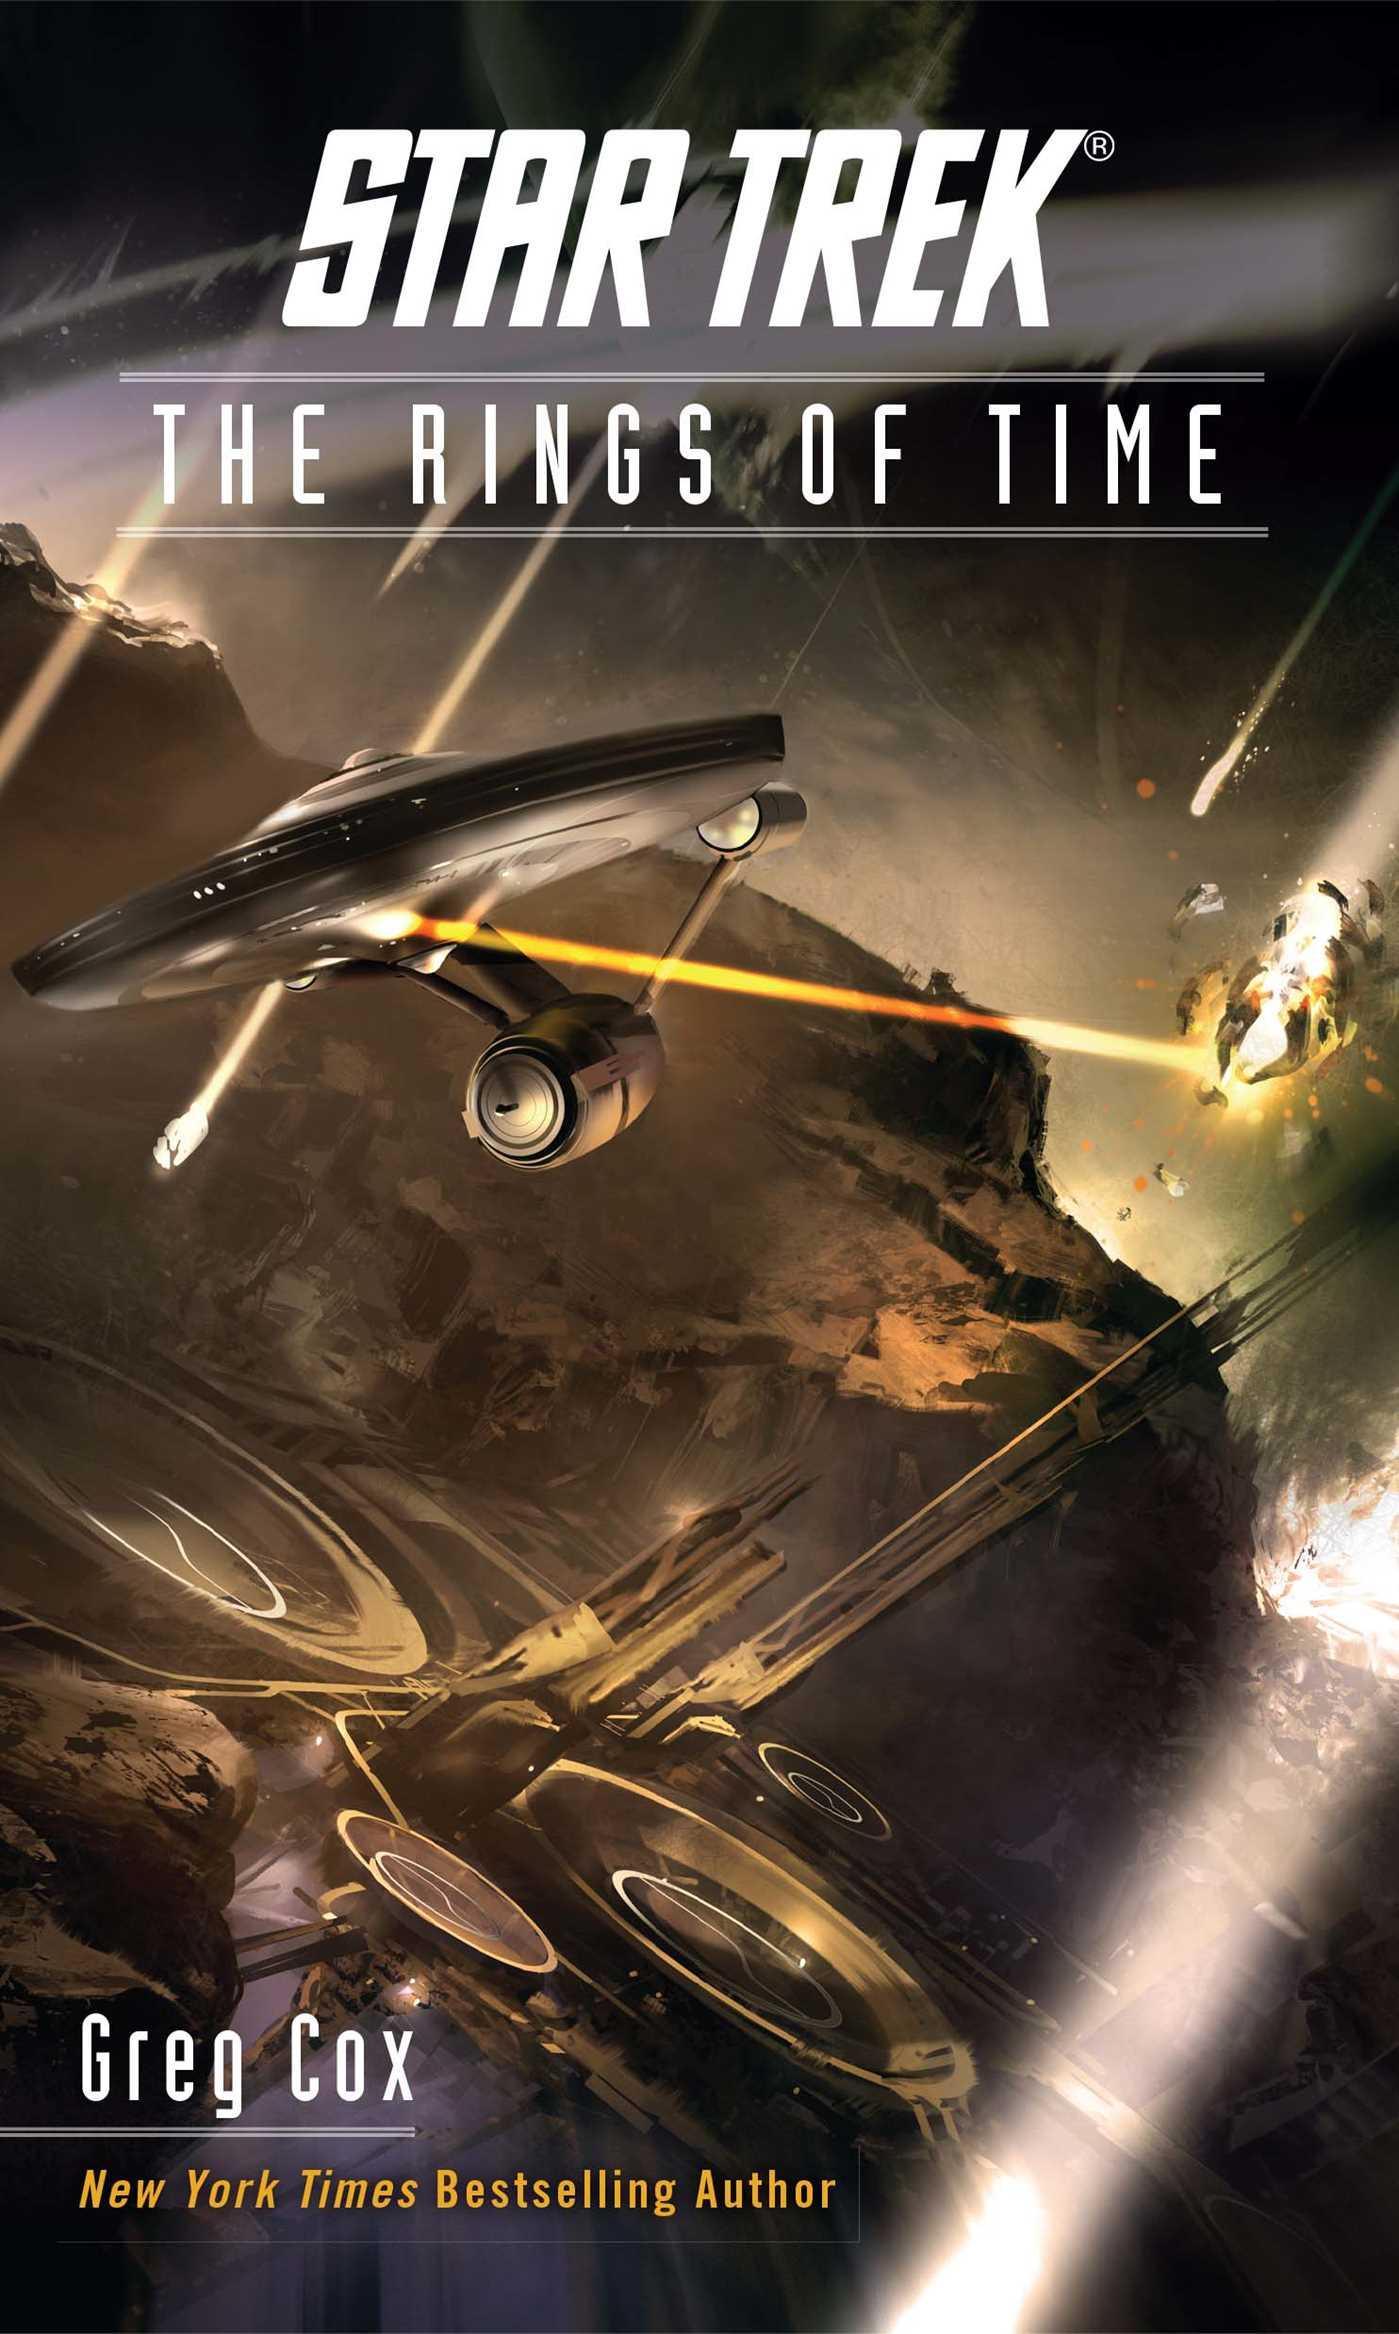 Star trek the original series the rings of time 9781501130199 hr